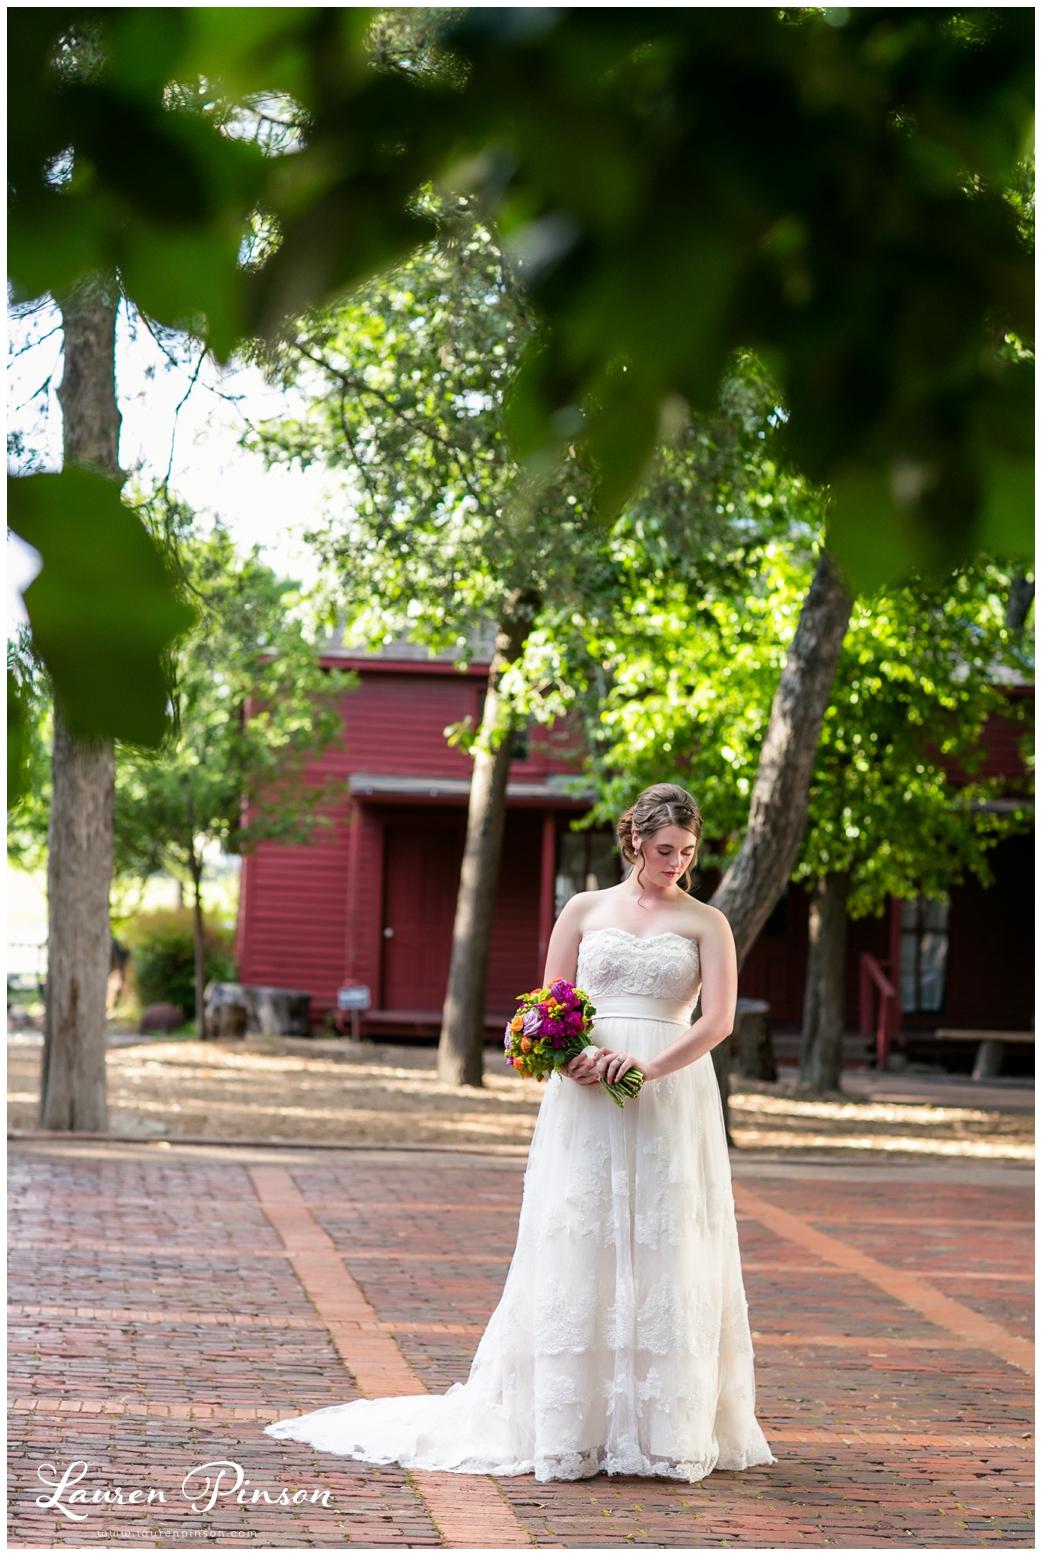 chestnut-square-downtown-mckinney-texas-wedding-photographer-sherman-northtexas-bridal-portraits-photography_0211.jpg